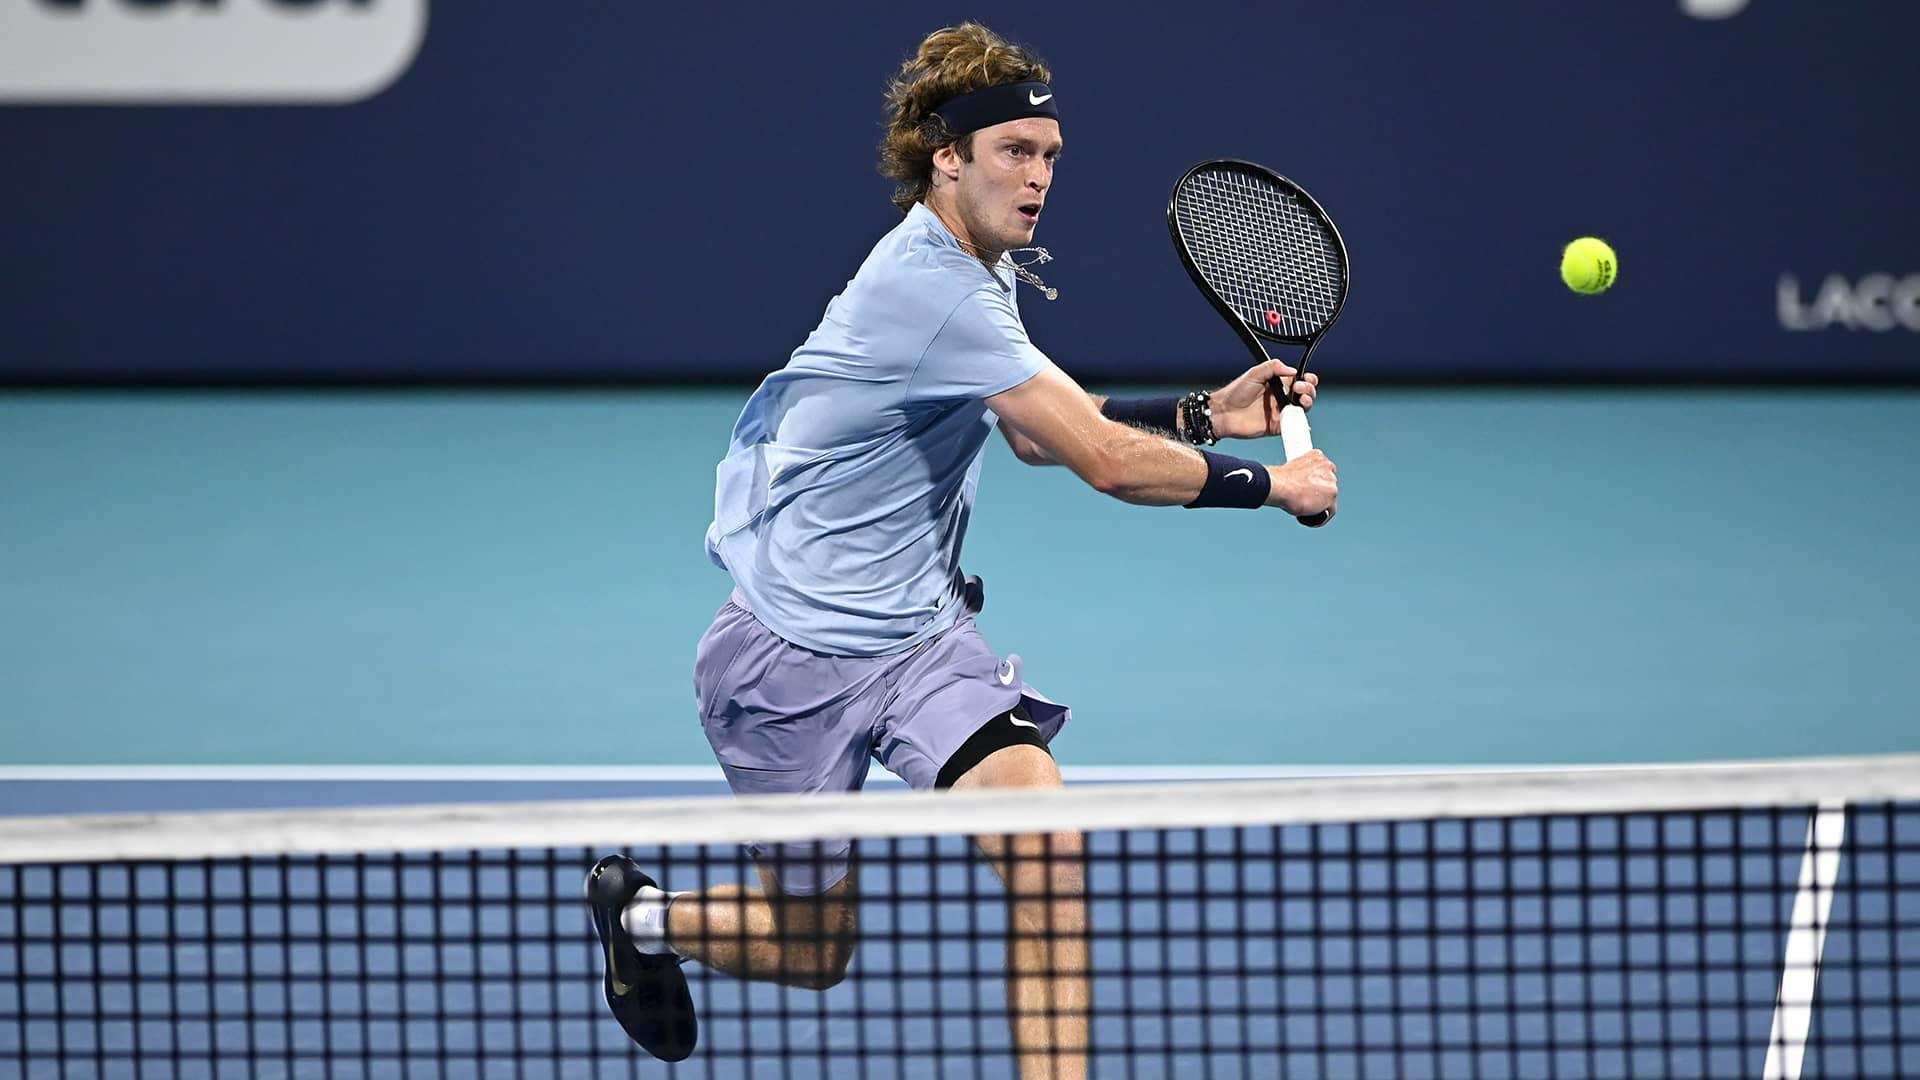 Miami Open 2021: Andrey Rublev vs. Sebastian Korda Tennis Pick and Prediction